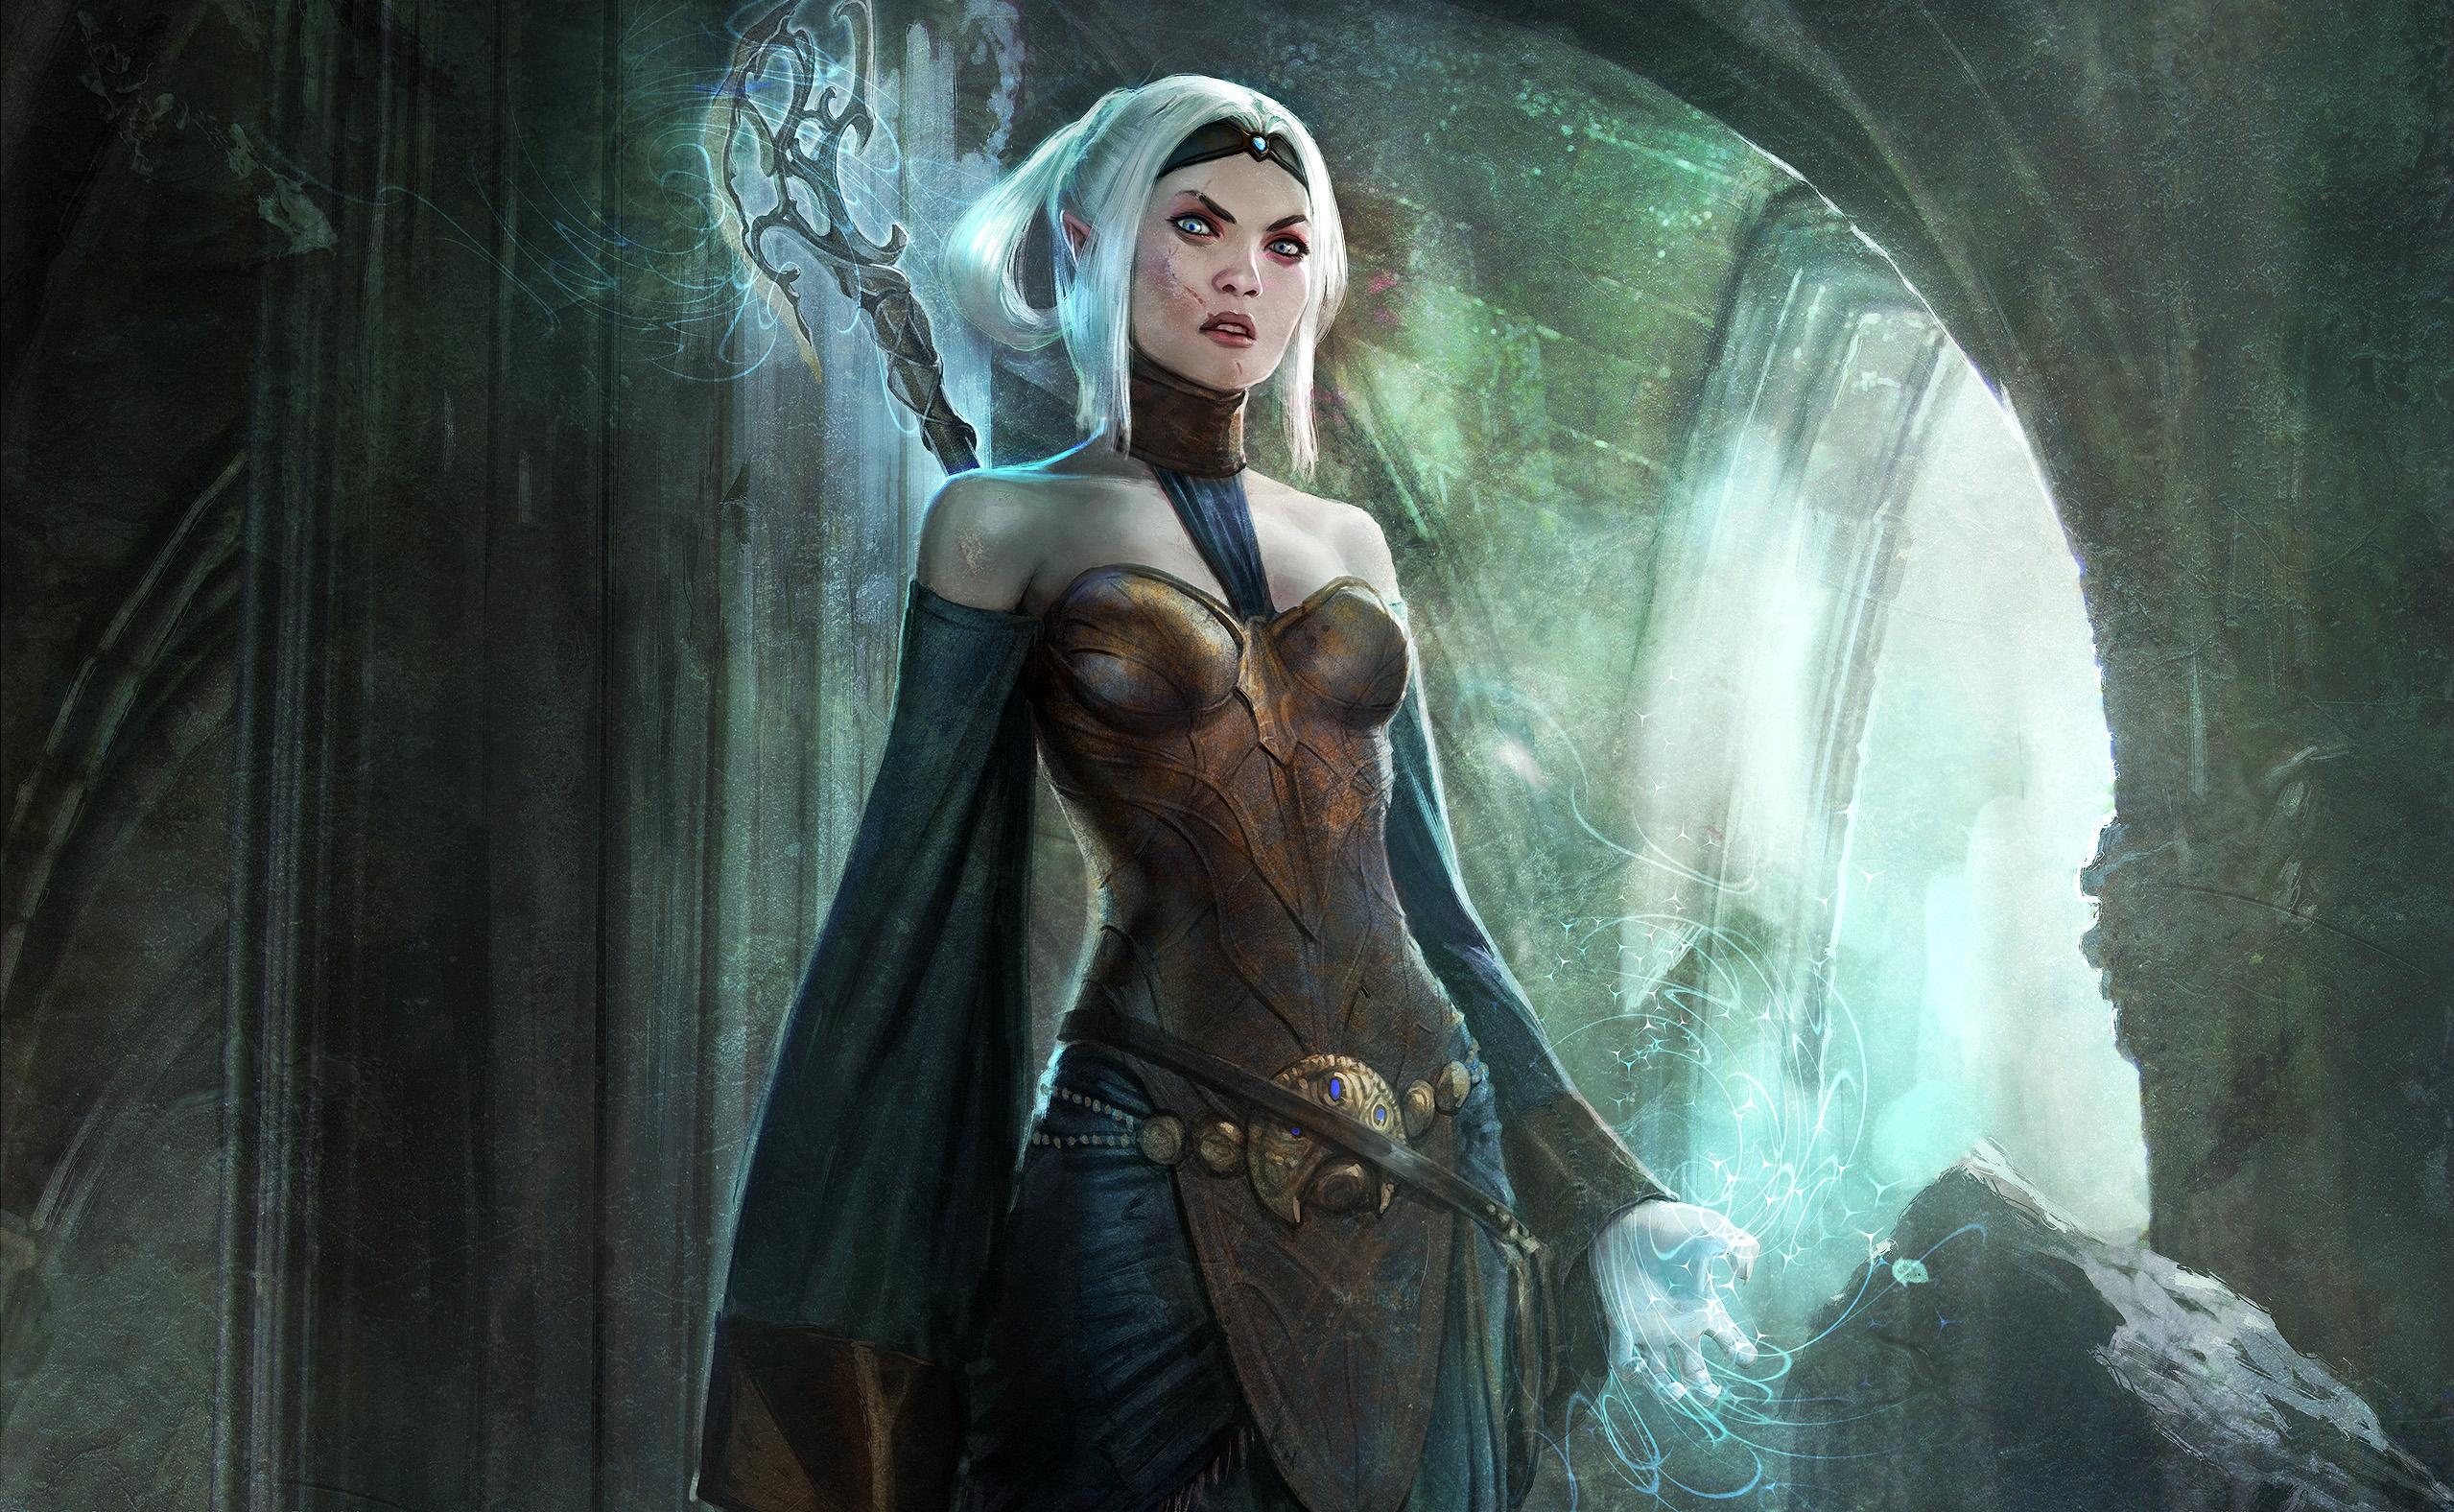 Dragon Age Origins Wallpapers: Dragon Age: Origins Computer Wallpapers, Desktop